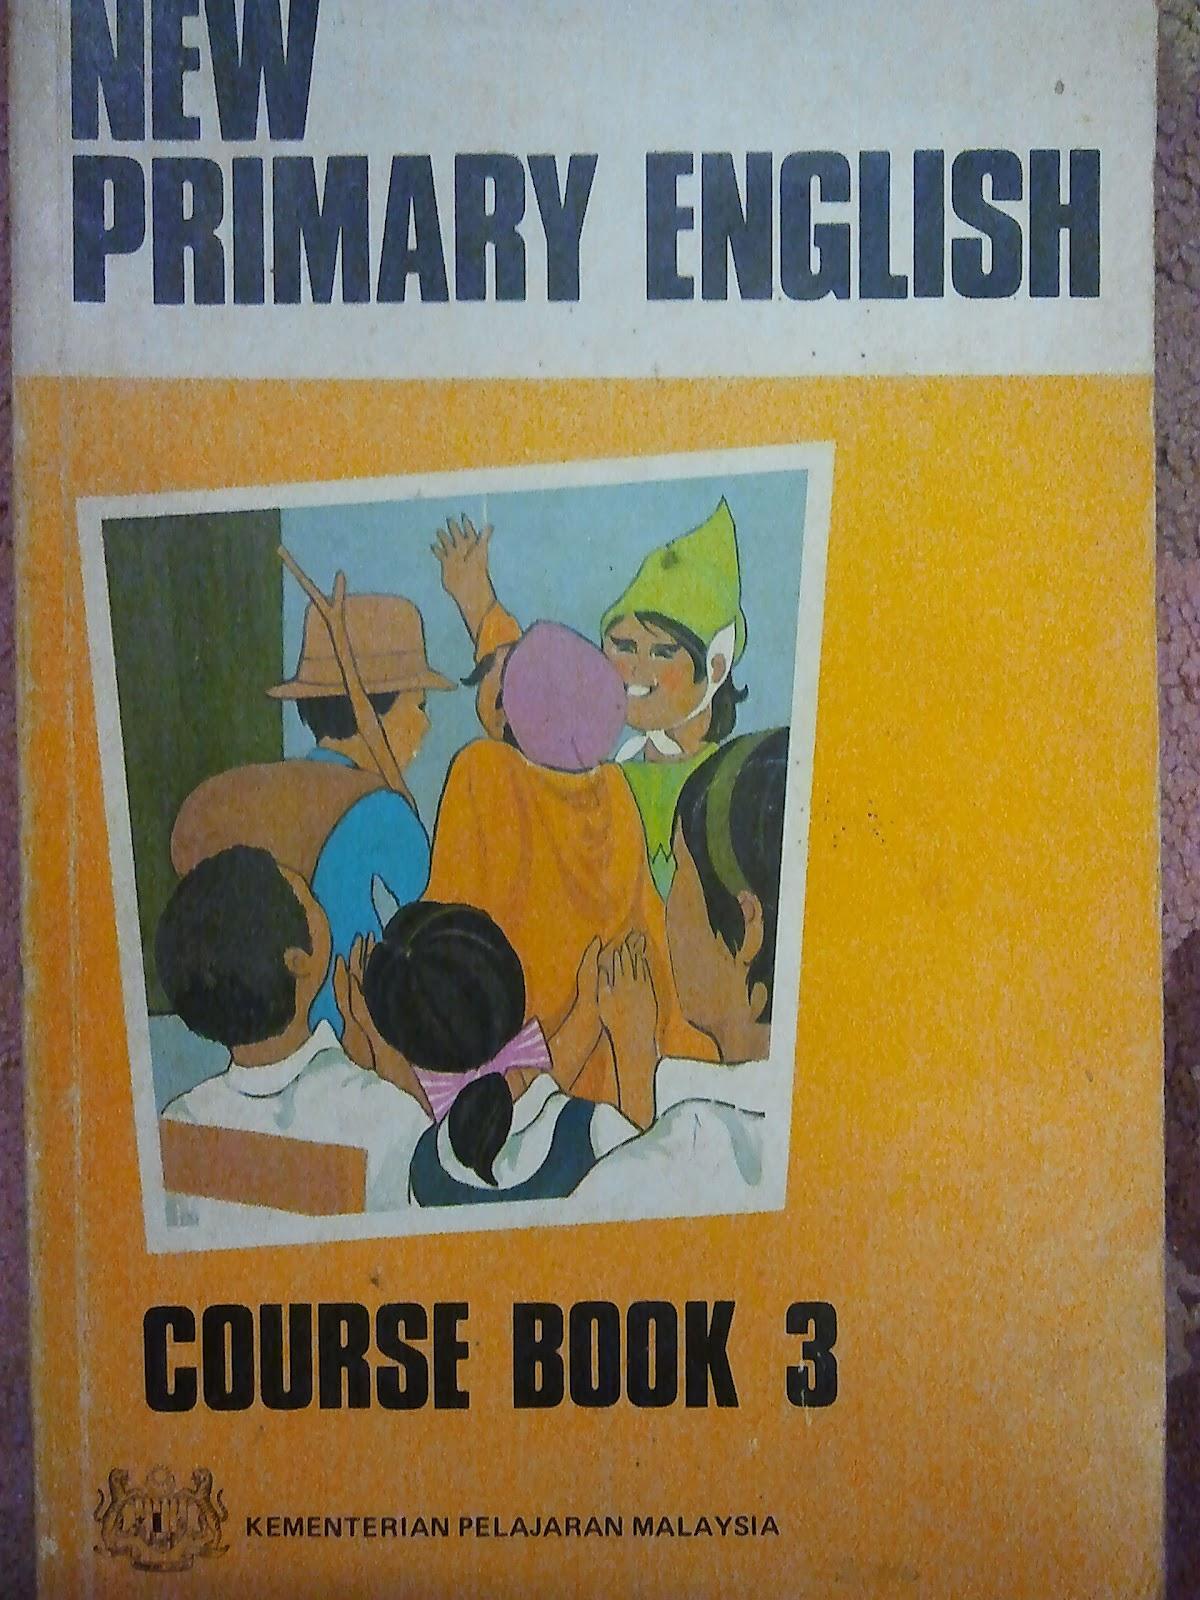 Buku Teks Zaman Dulu  Kau Tahu Tak